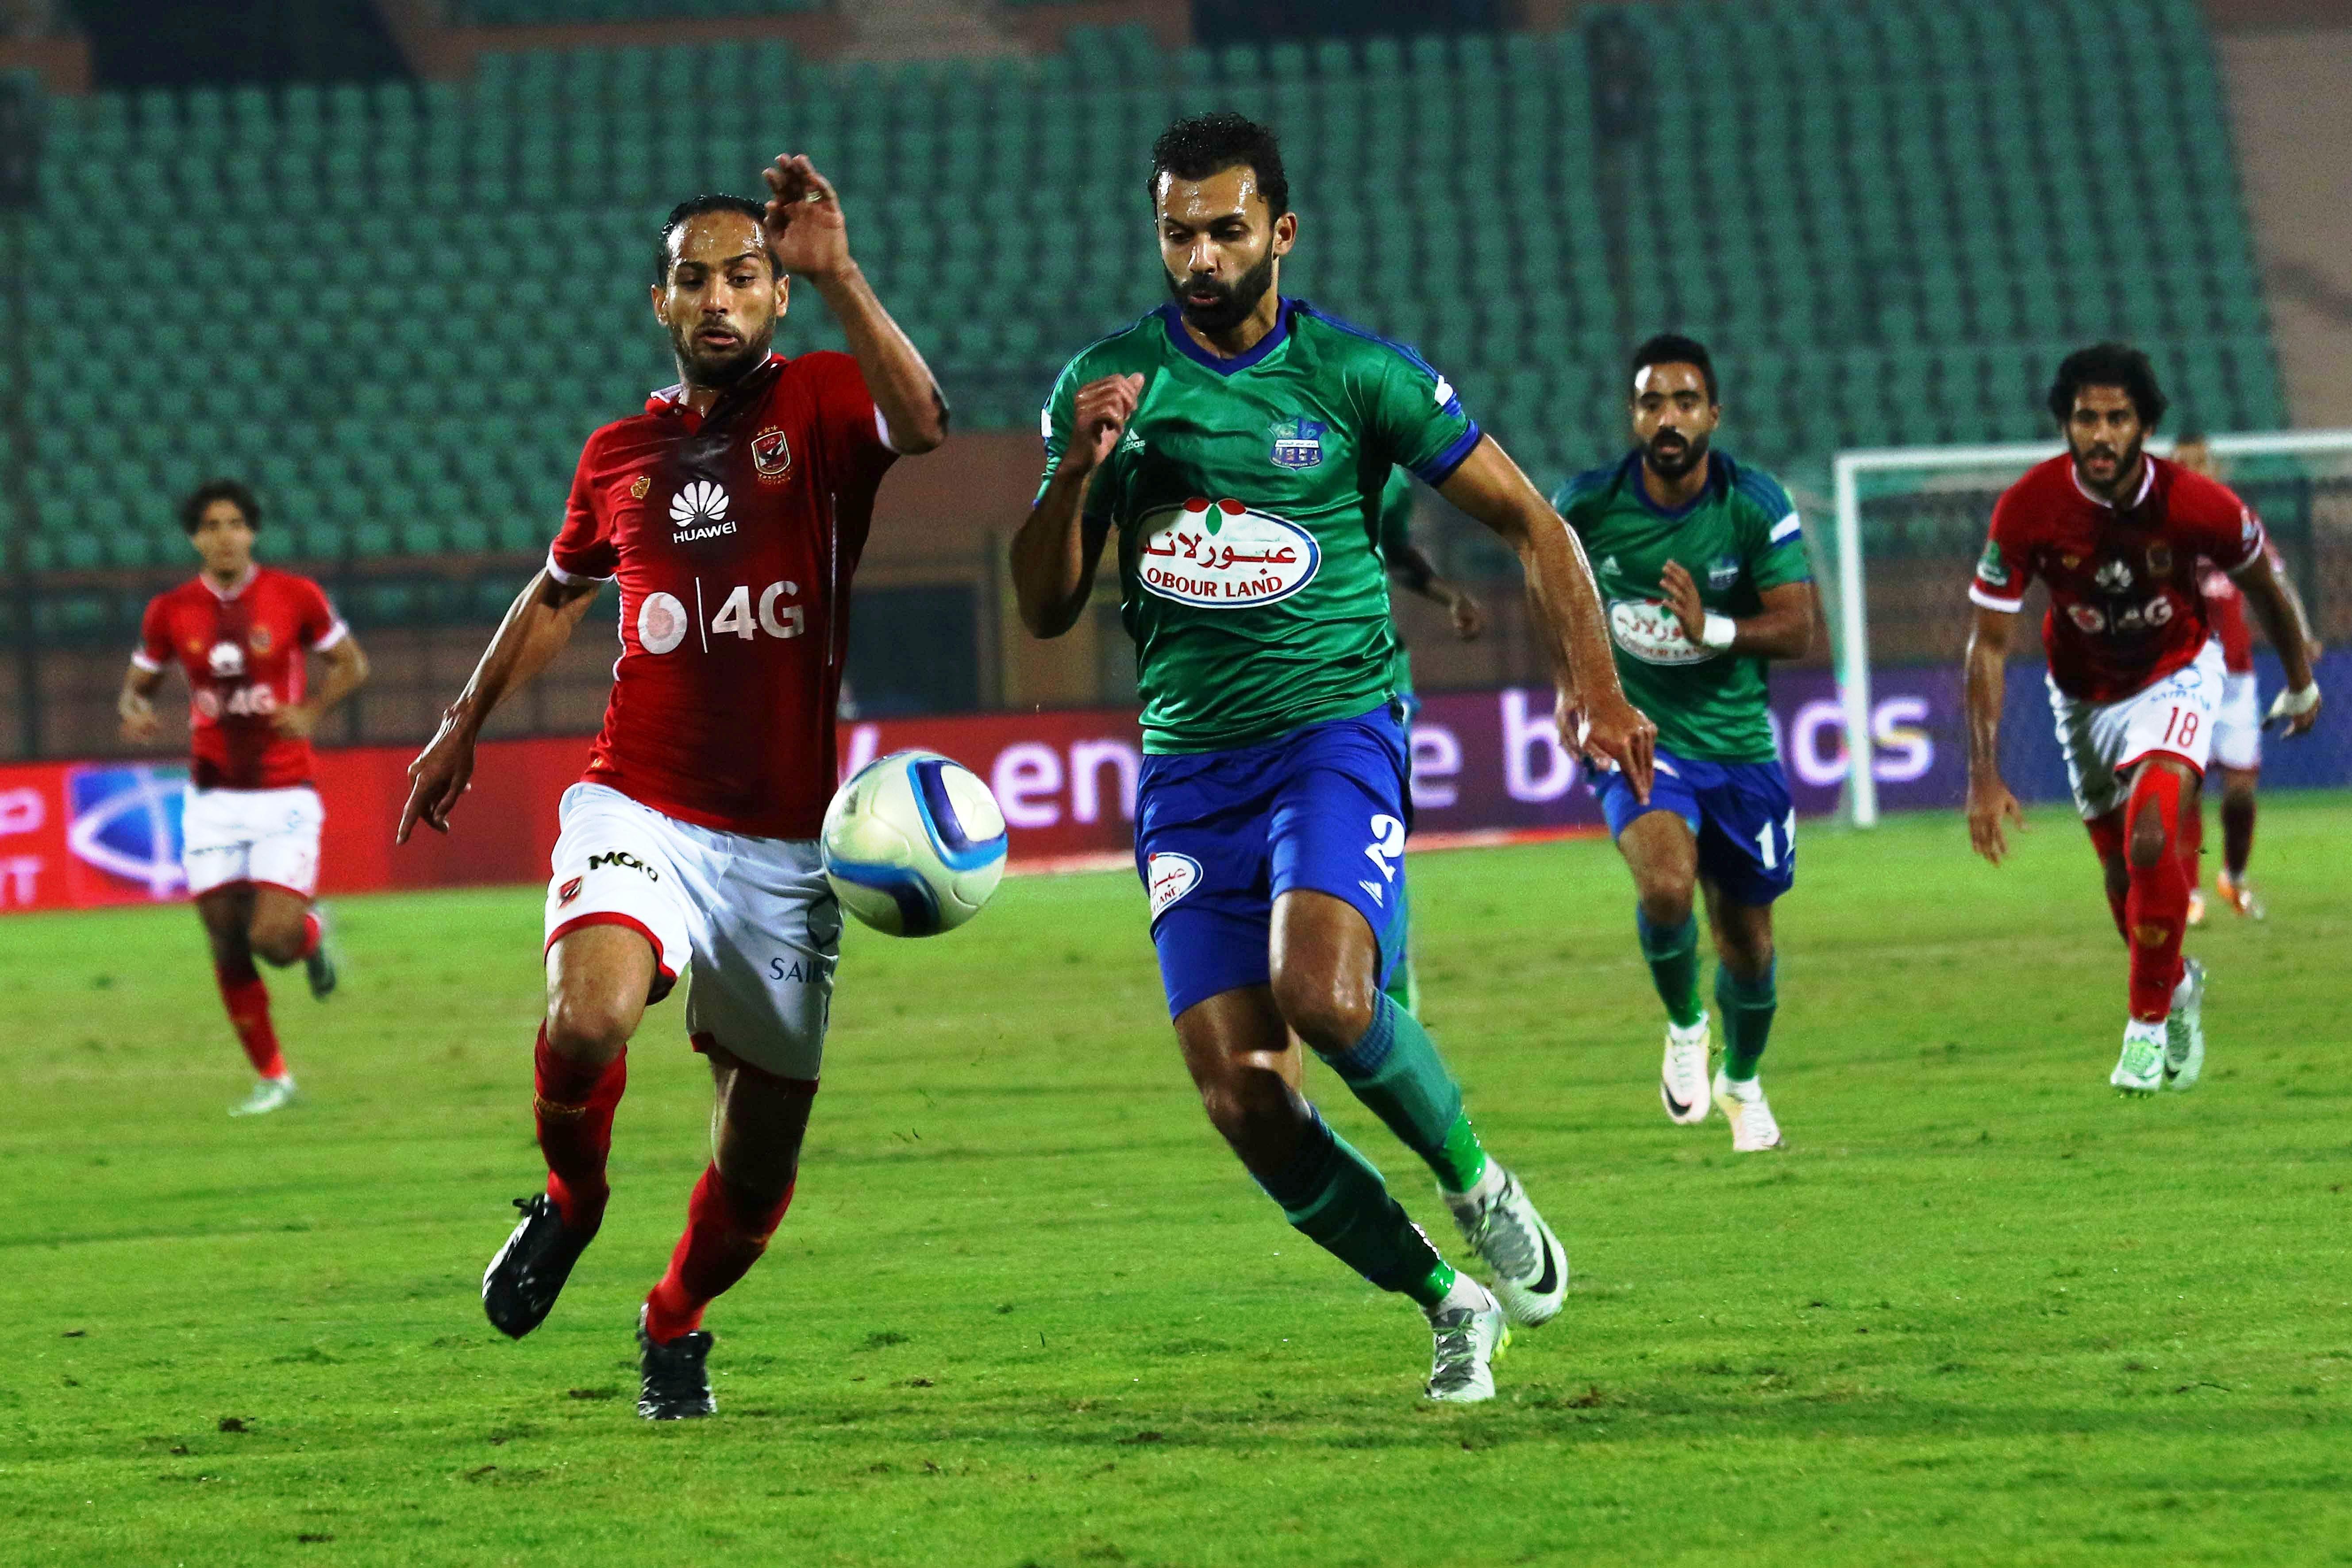 walid soliman - Misr Lel Makasa v Al Ahly - 4-12-2016